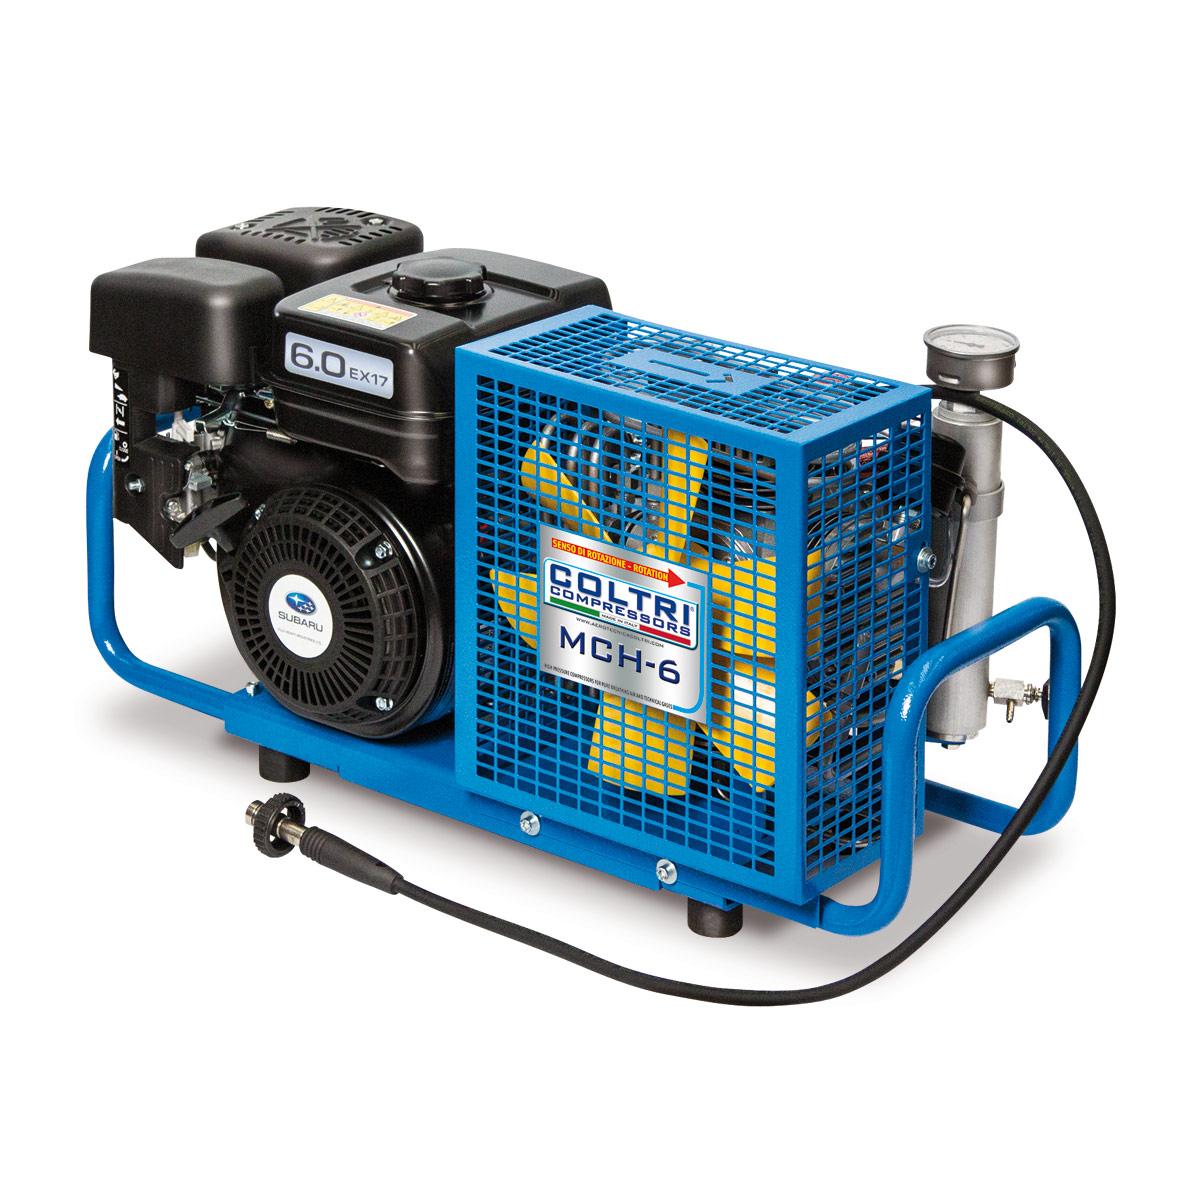 Бензинов портативен водолазен компресор MCH 6 SR 232/300 бара / SUBARU – Coltri